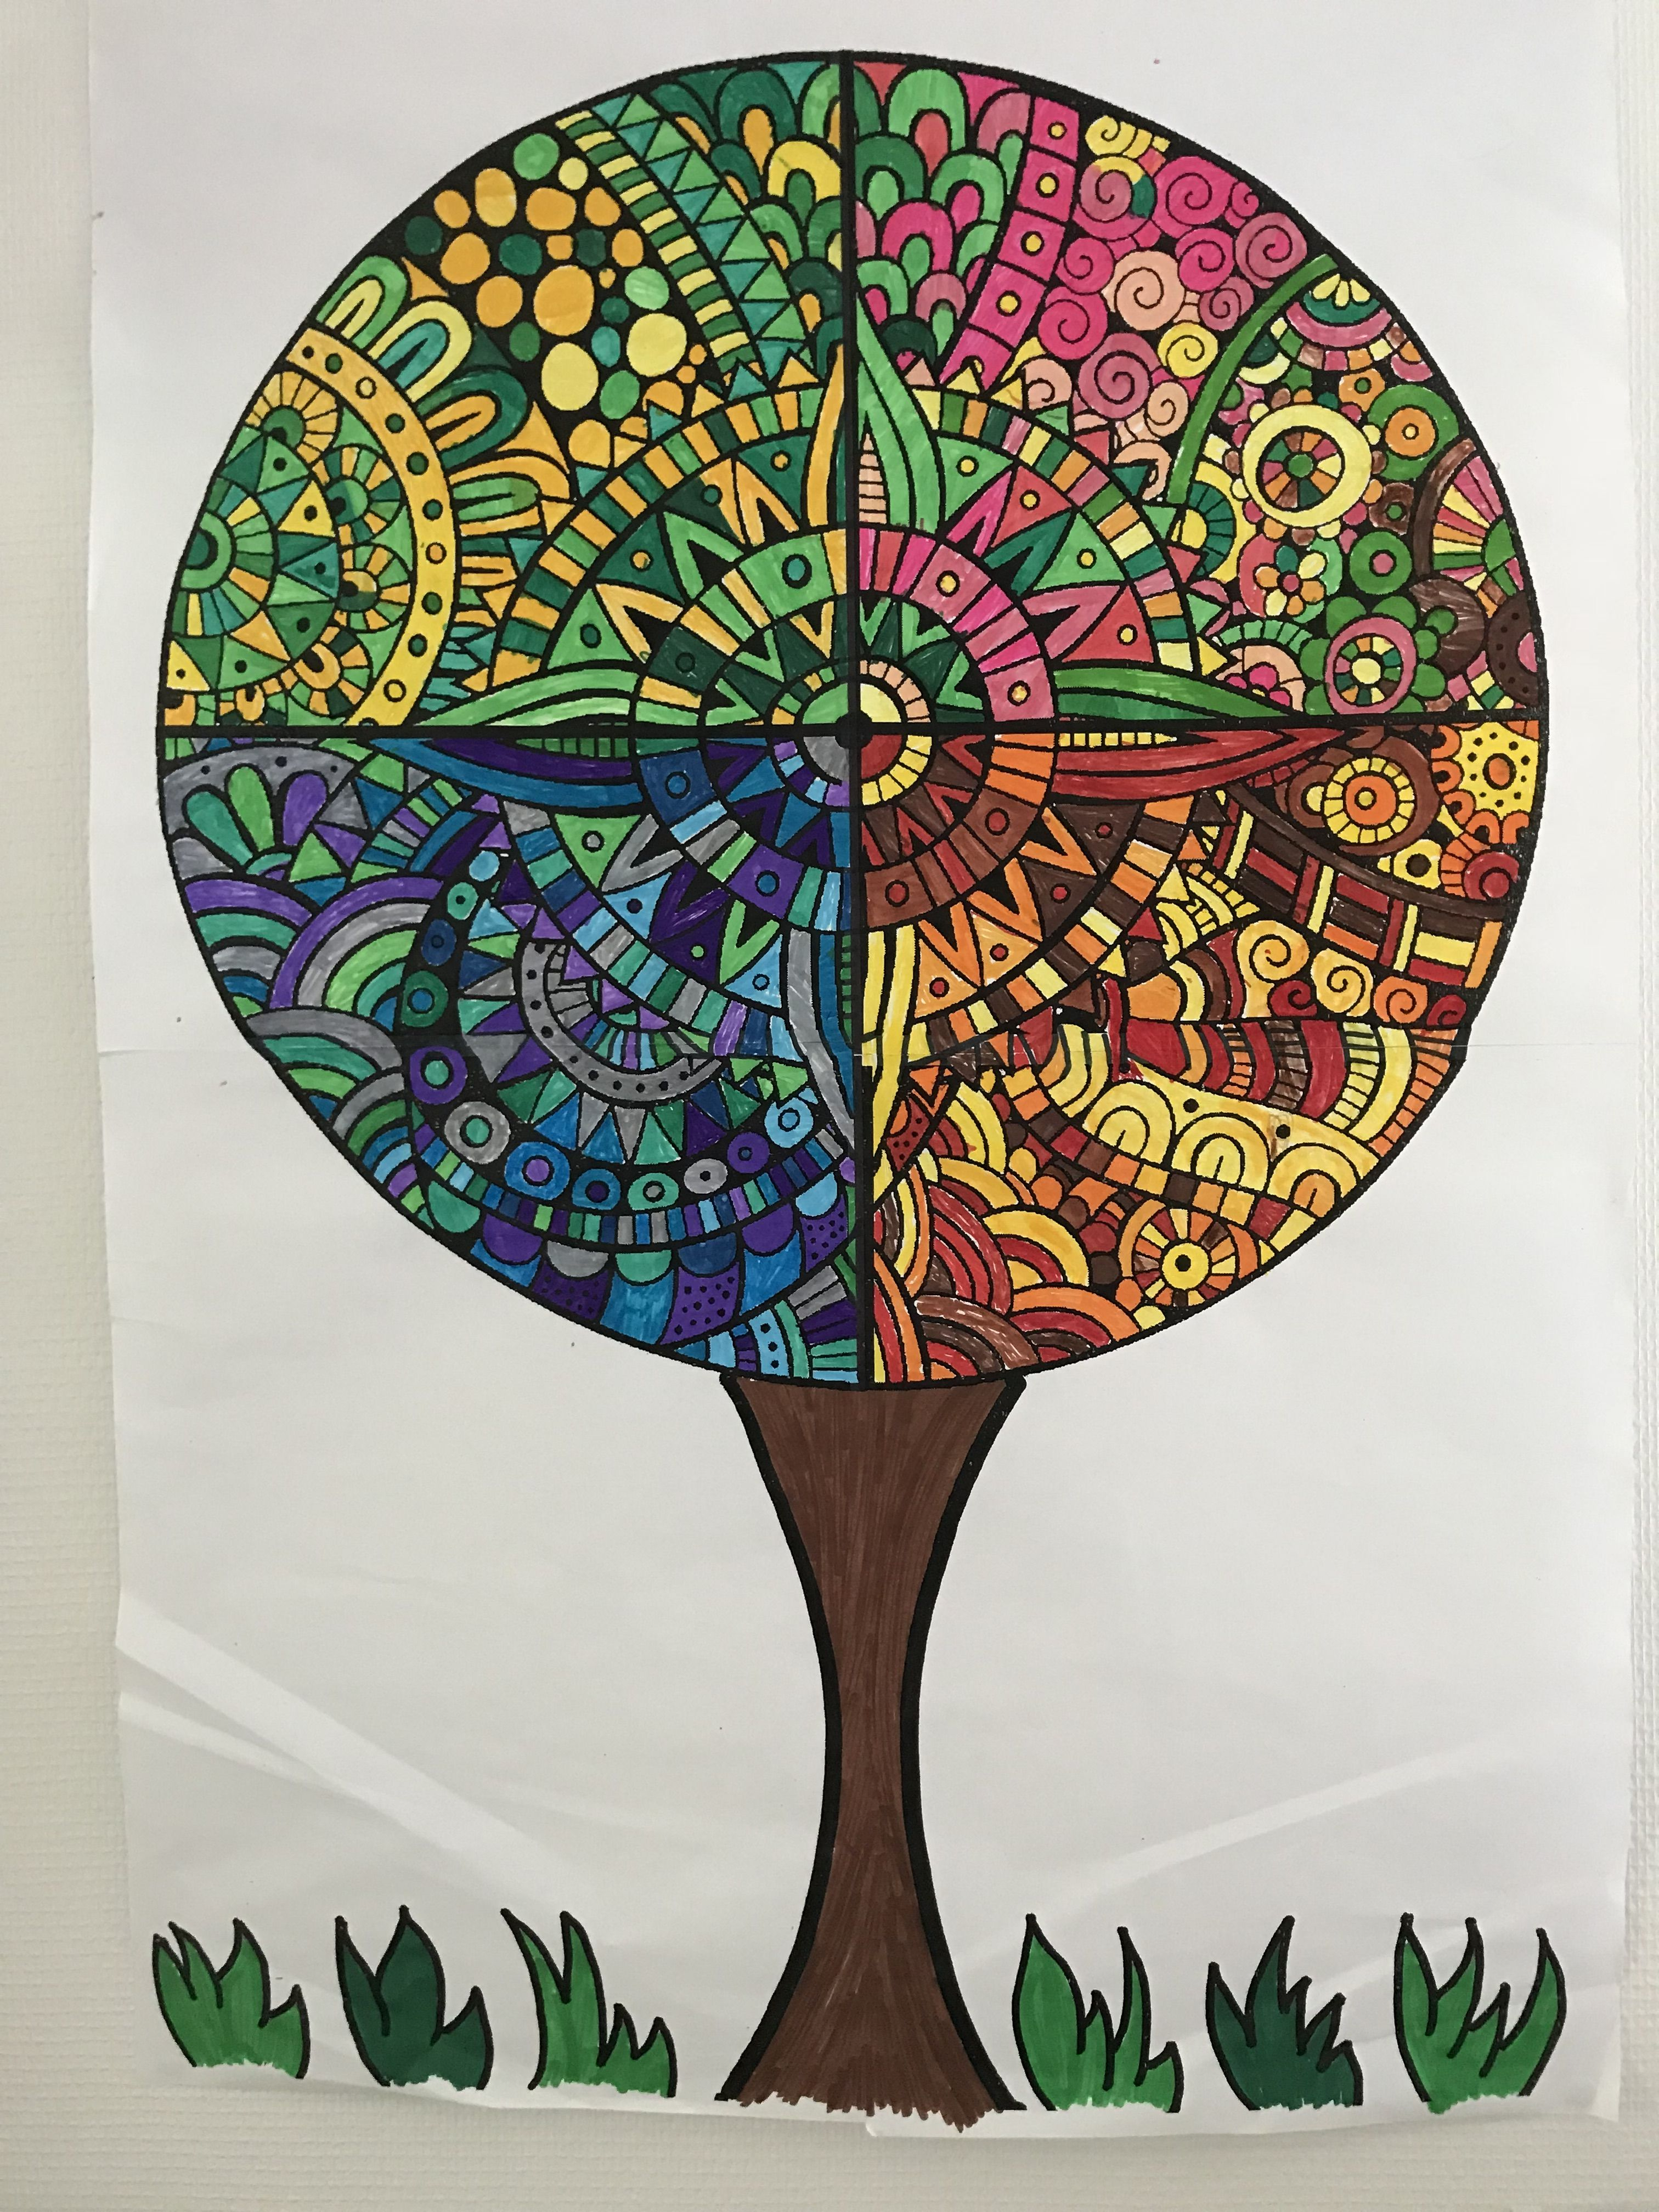 Travail collaboratif mandala agrandissement double a3 cp arts plastiques cycle 2 - Mandalas cycle 3 ...